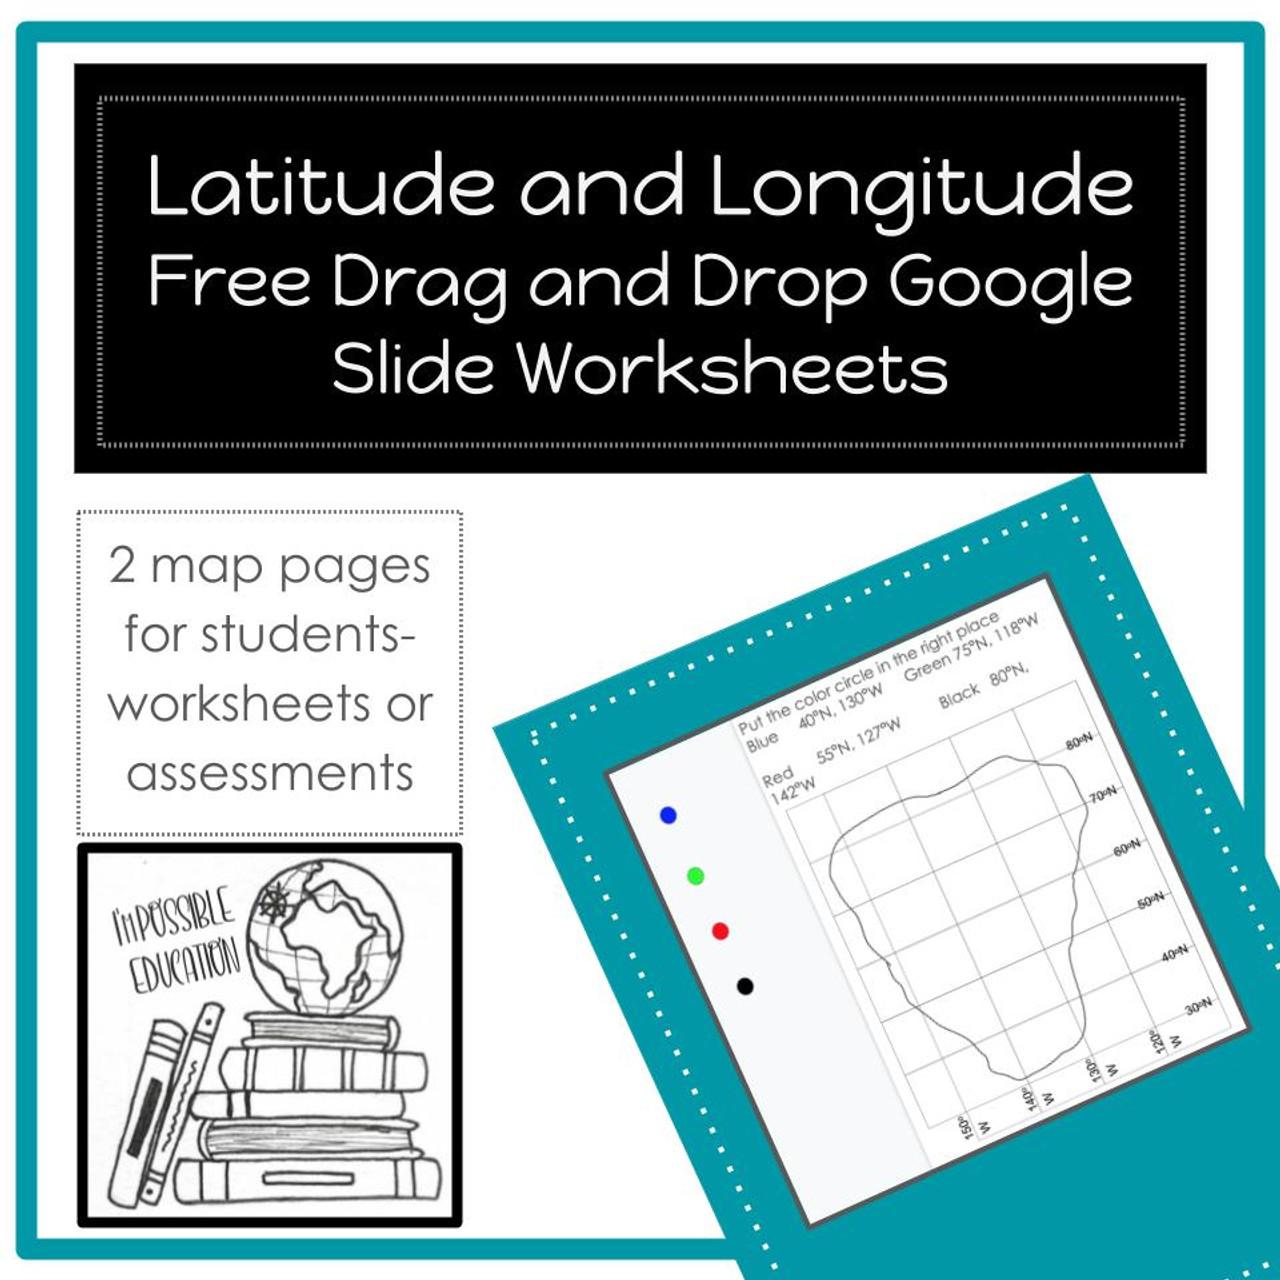 Latitude and Longitude Worksheets- Digital Drag and Drop - FREE [ 1280 x 1280 Pixel ]